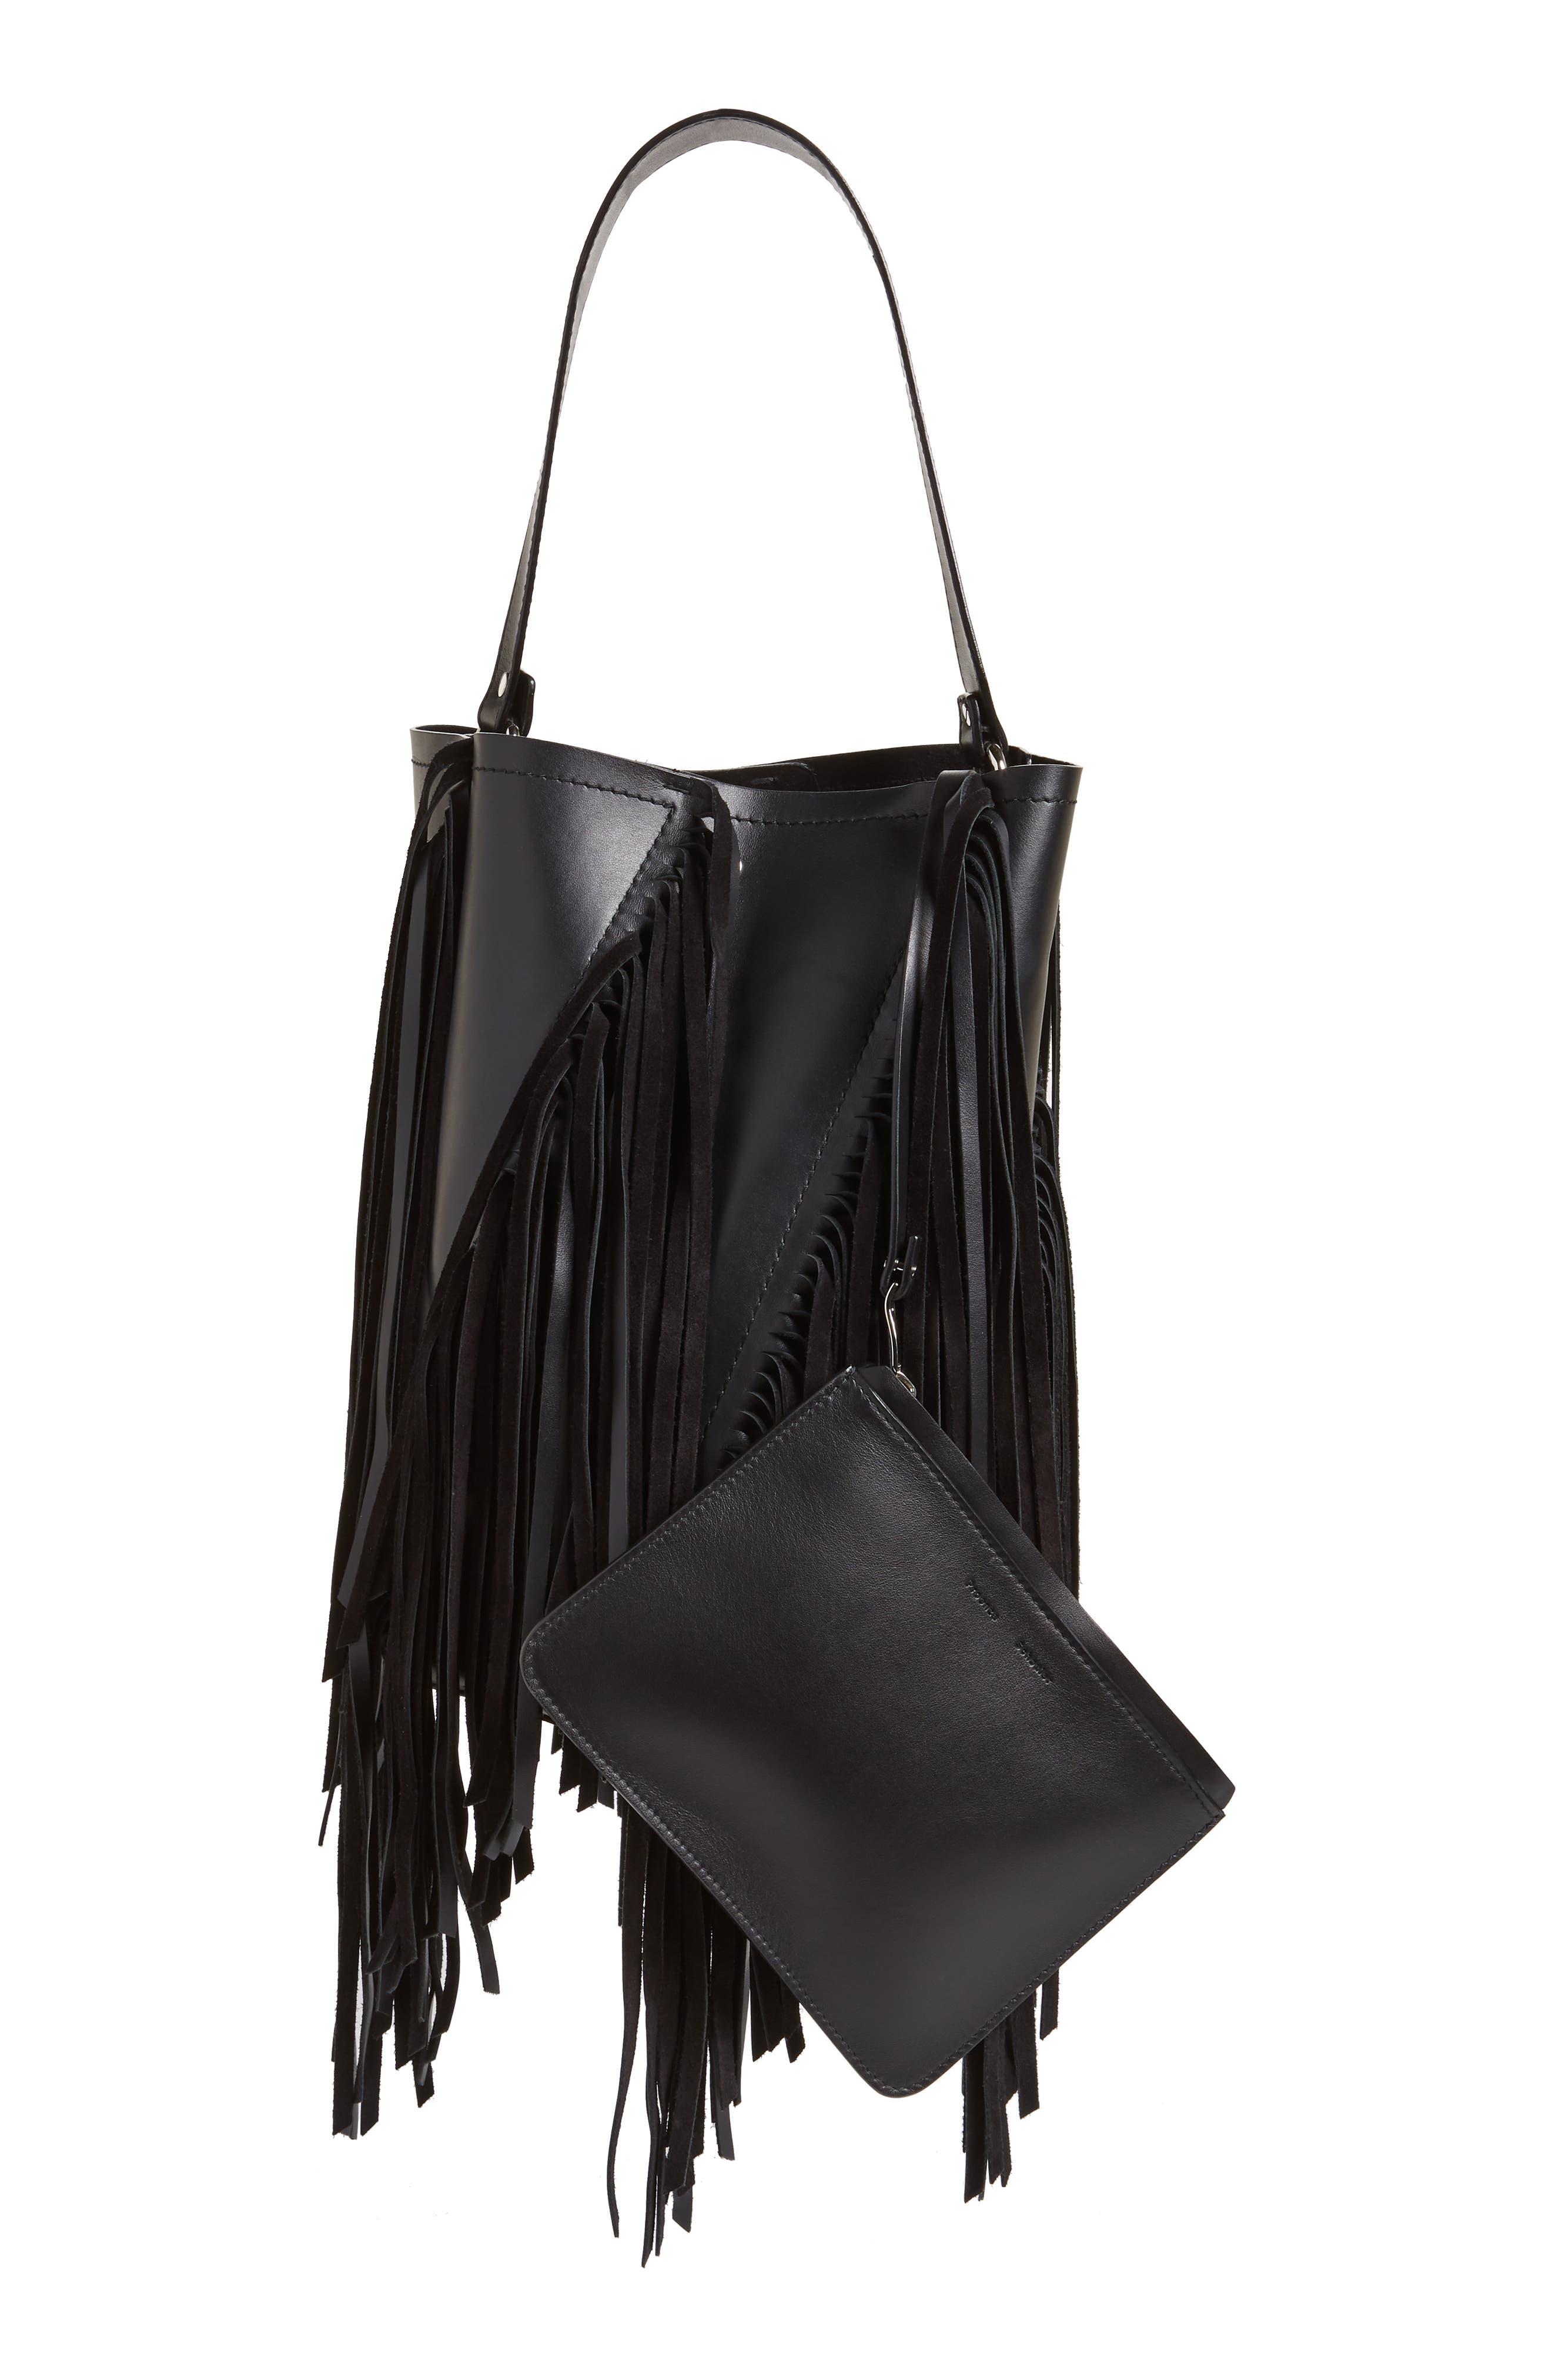 PROENZA SCHOULER, Medium Hex Fringe Calfskin Leather Bucket Bag, Alternate thumbnail 3, color, BLACK/ BLACK